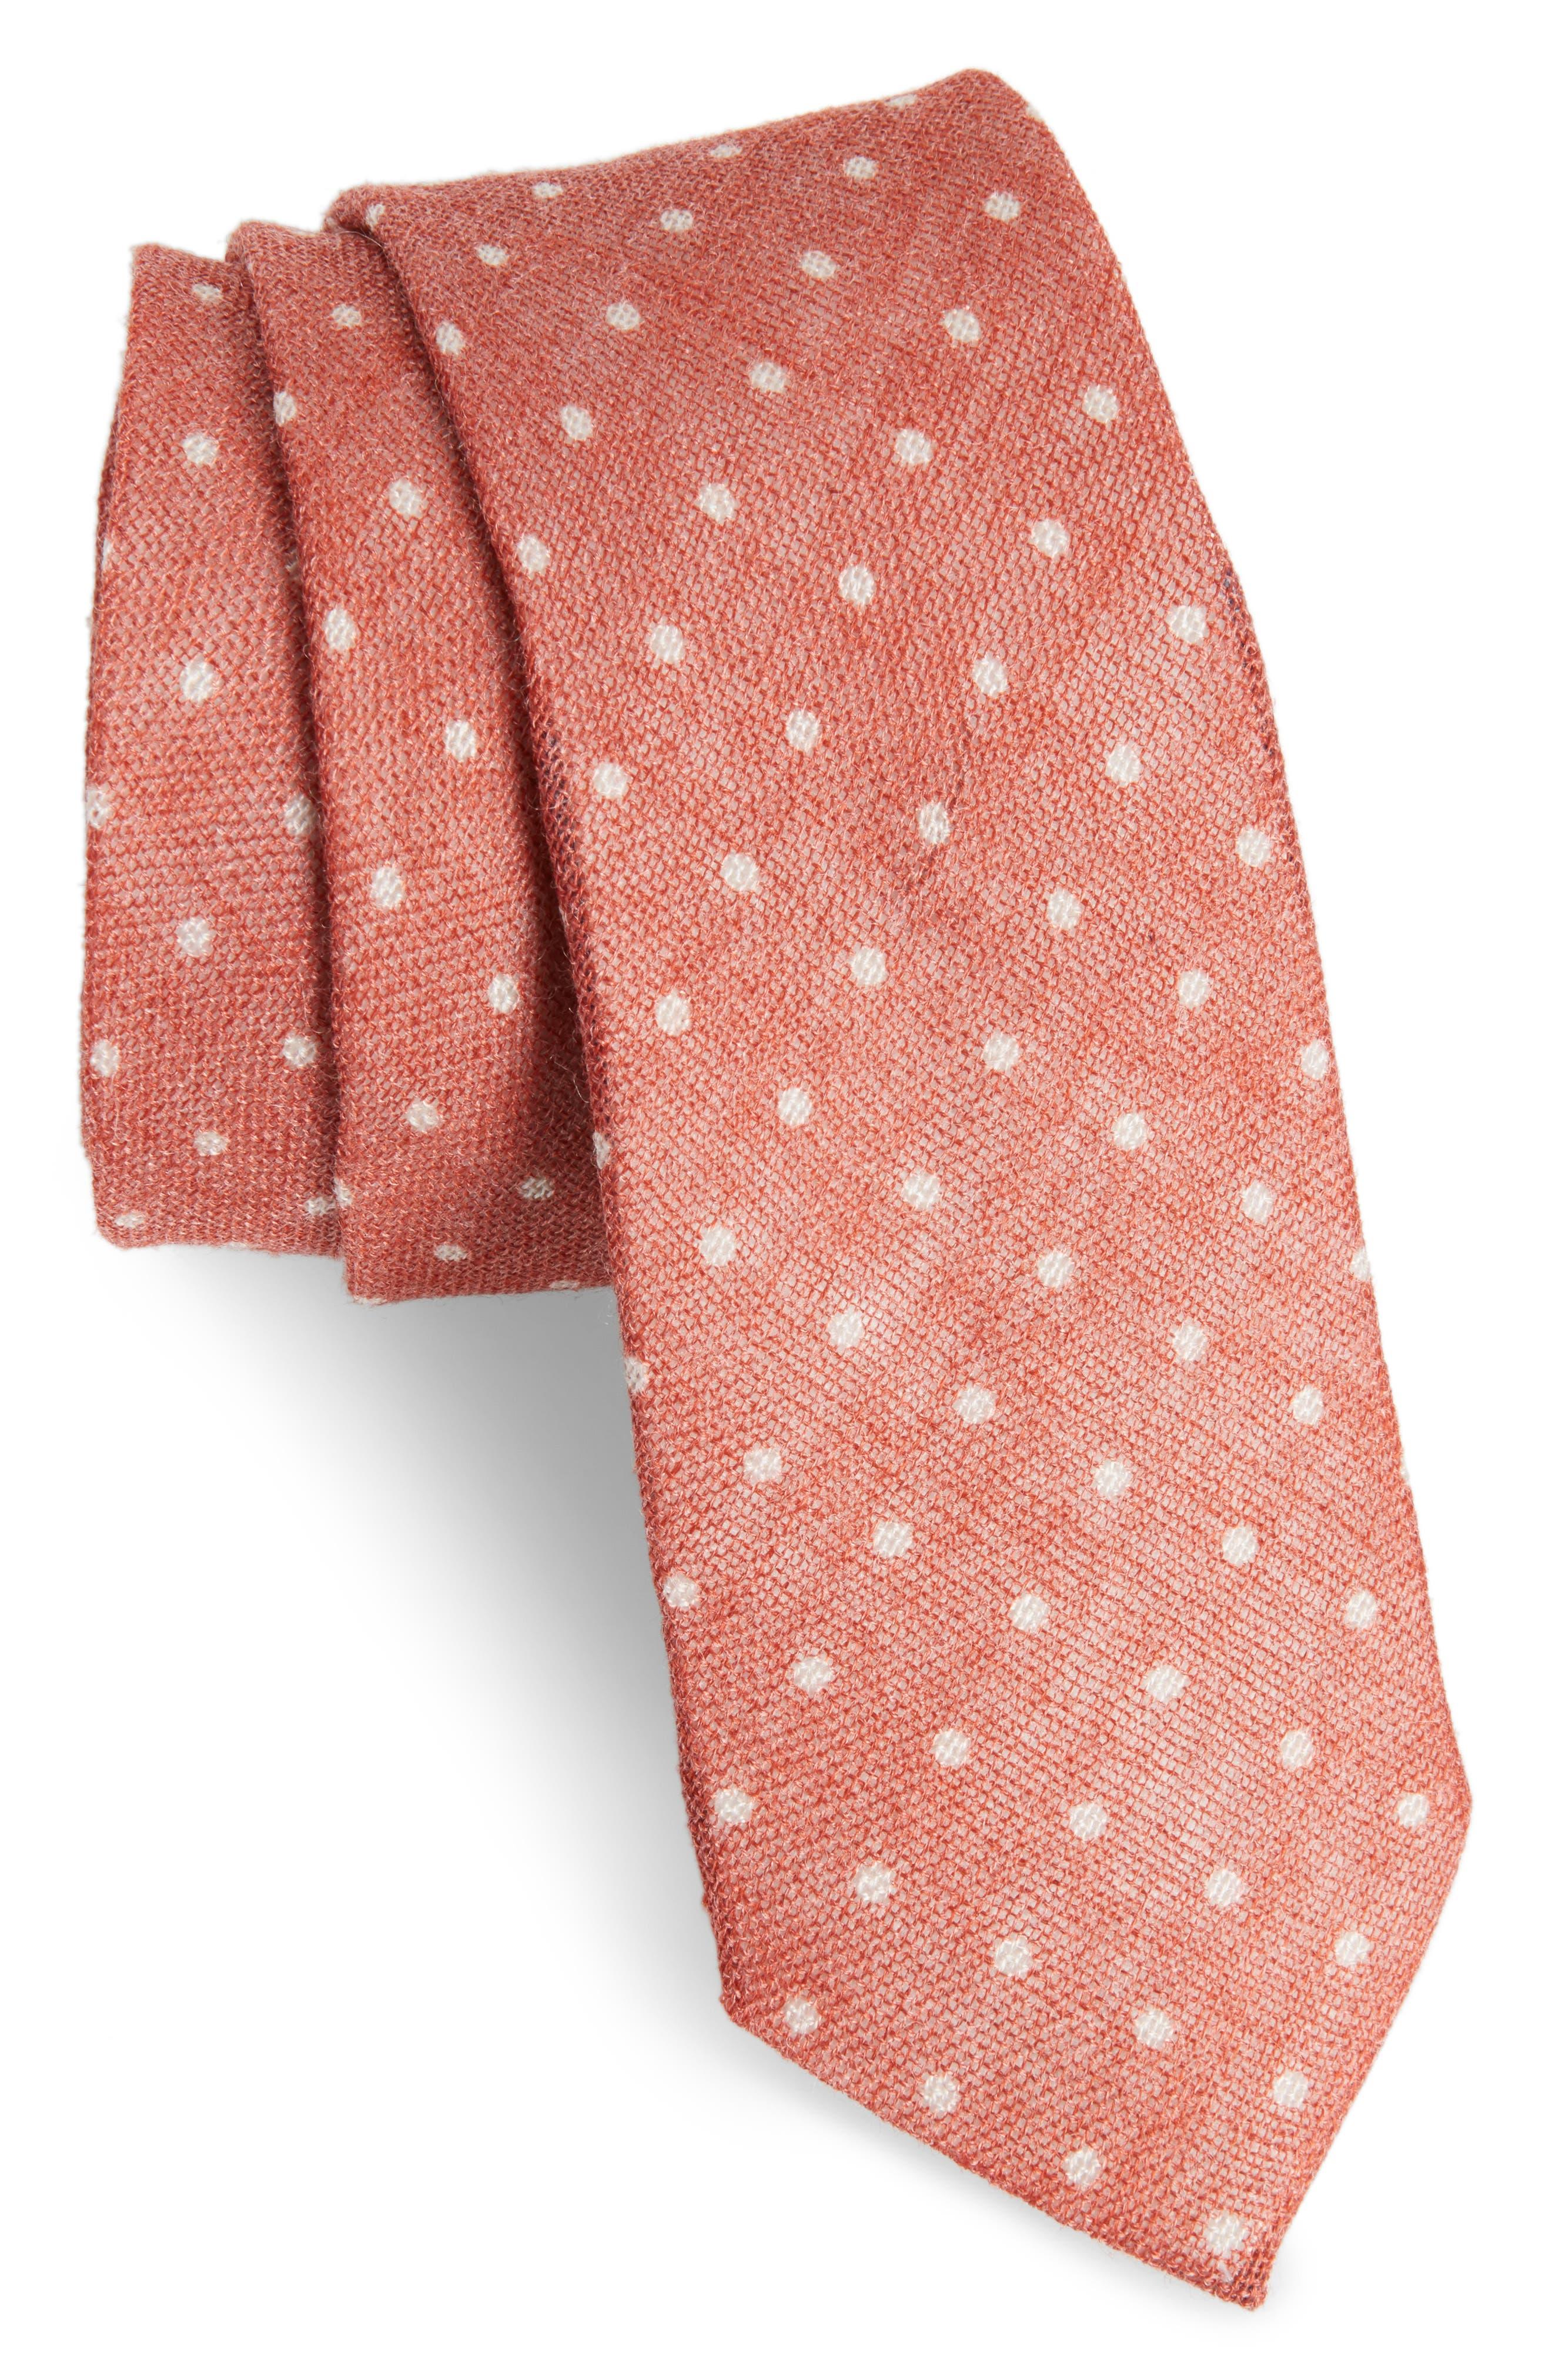 Bradford Dot Tie,                             Main thumbnail 1, color,                             Orange